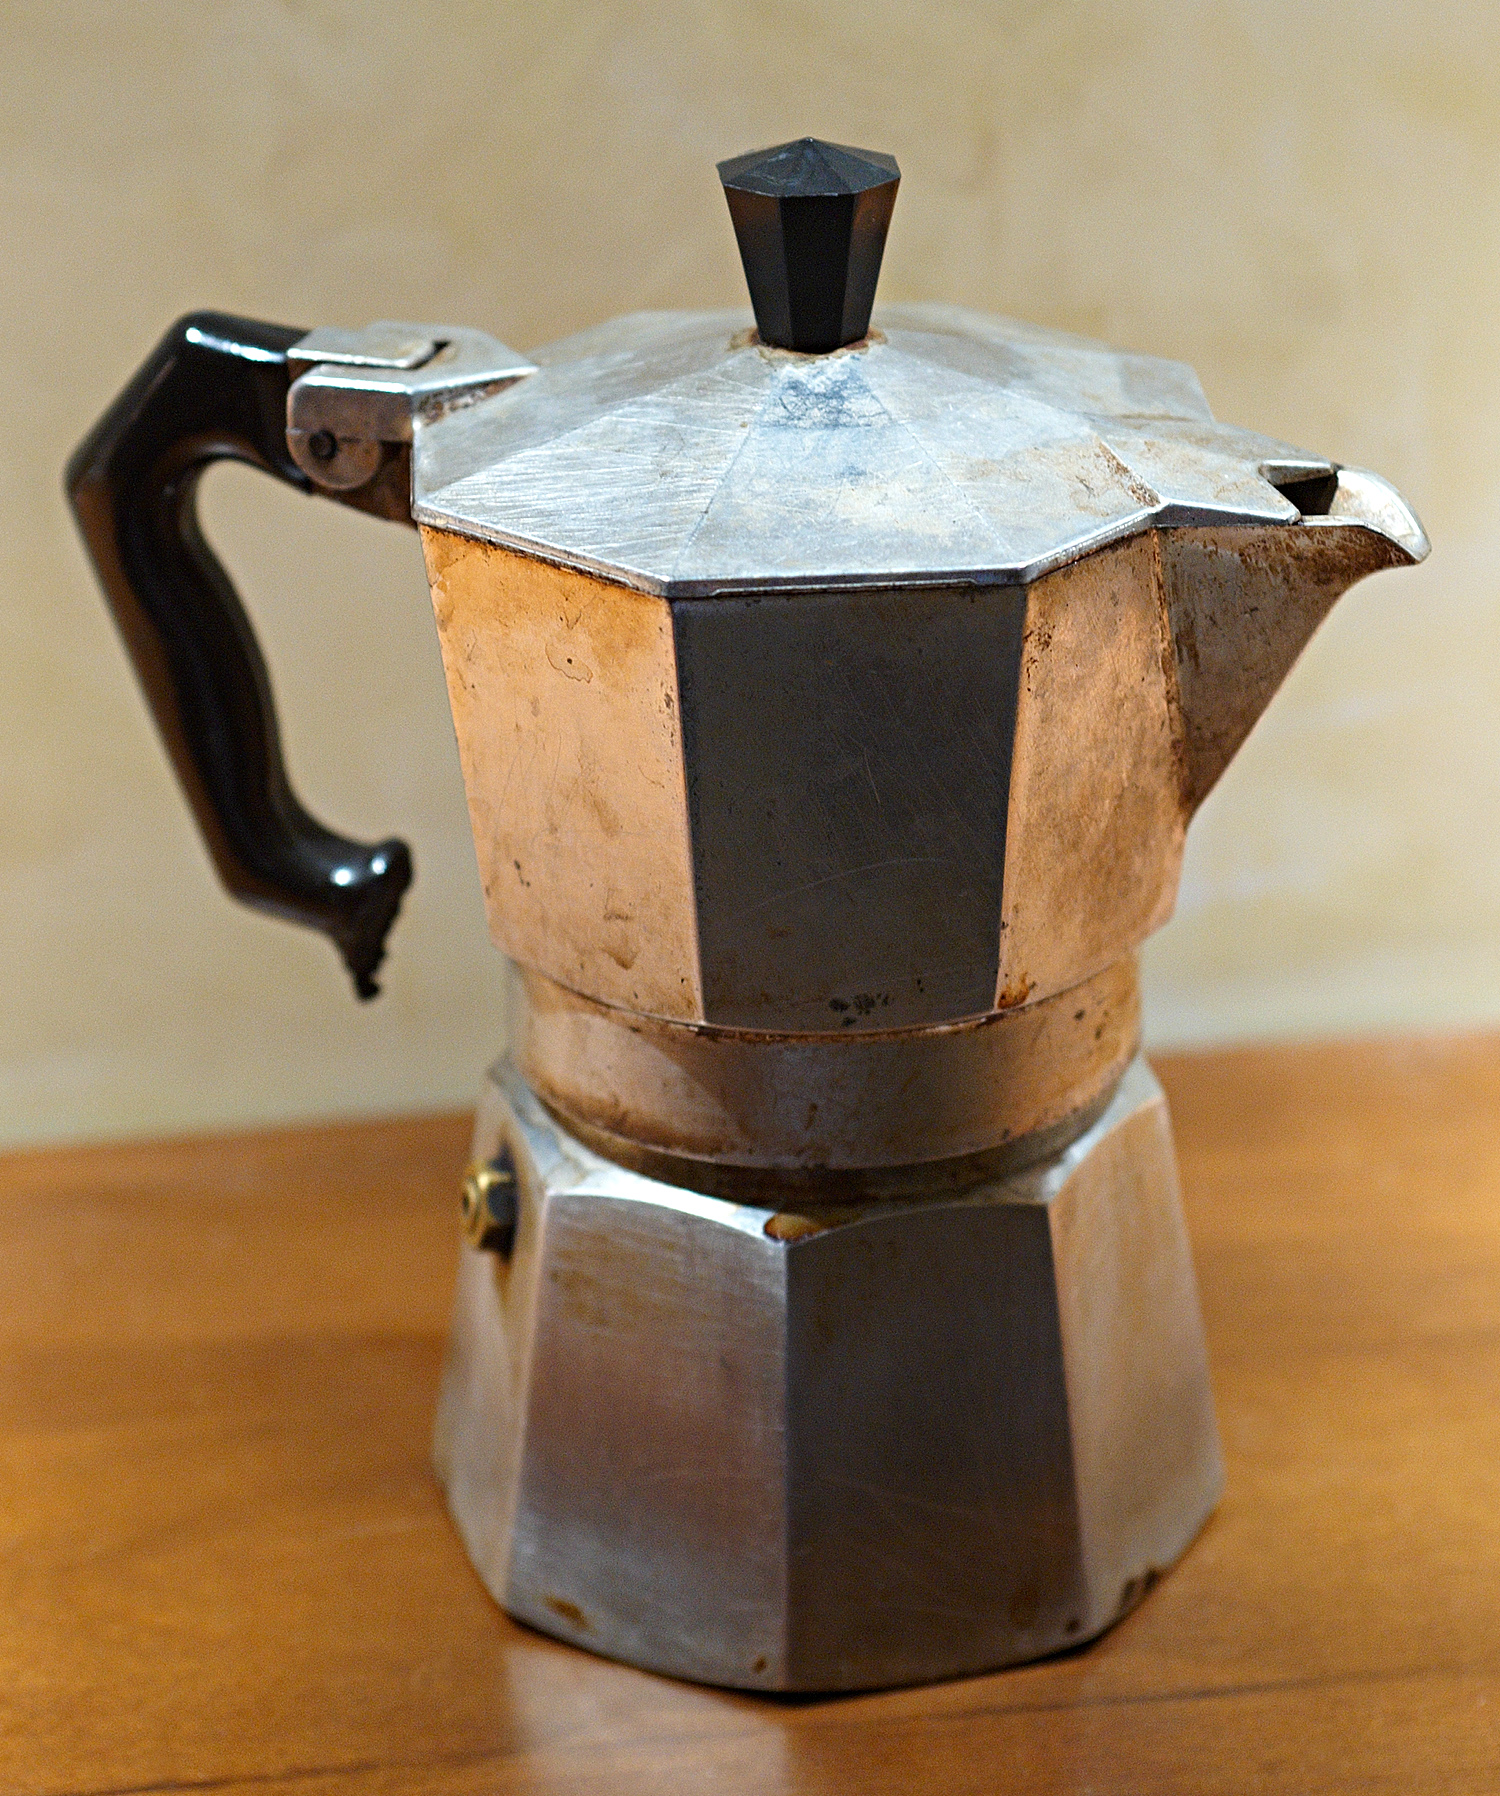 Mokka stovetop espresso old fashioned style